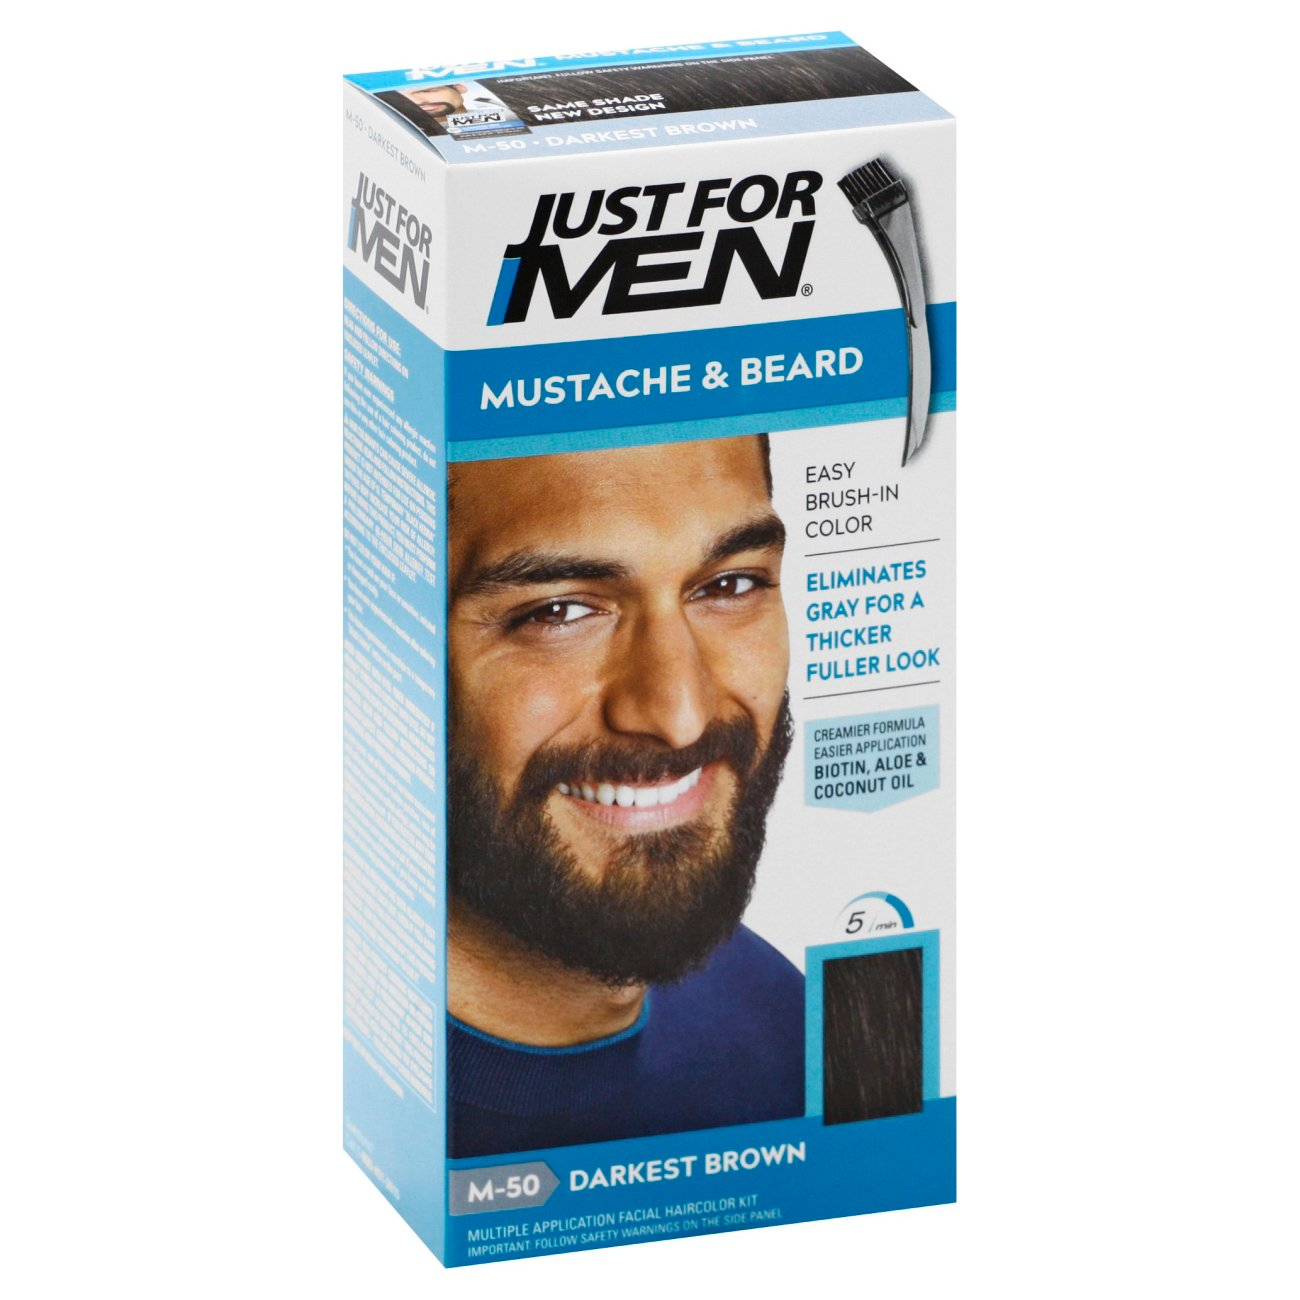 Just For Men Mustache & Beard Brush-In Color, Darkest Brown - Shop ...